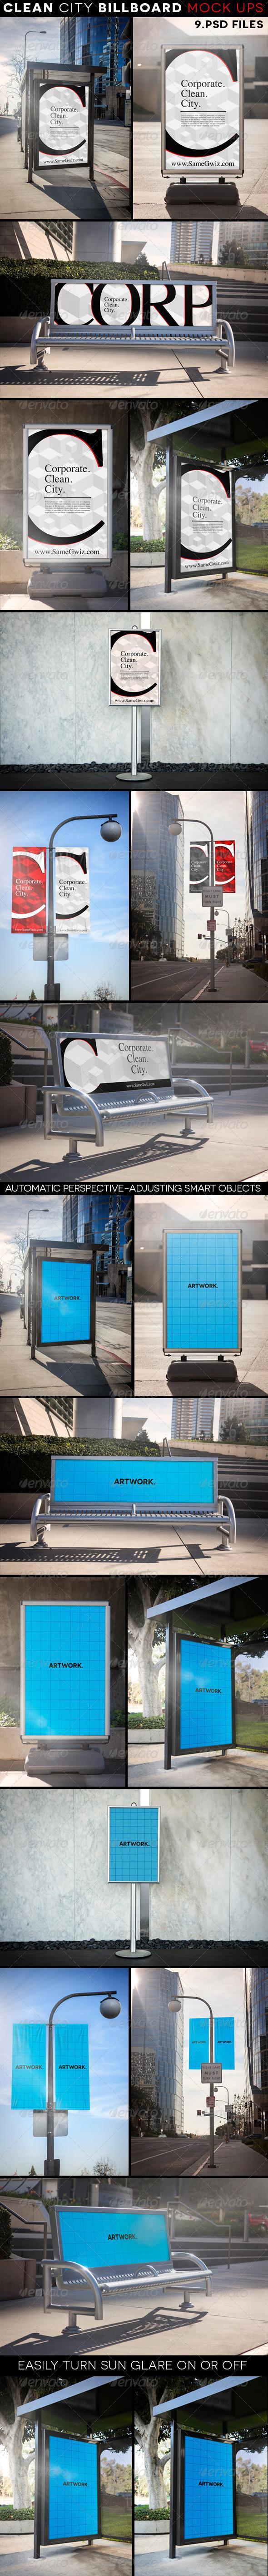 Clean City Advertising Billboard Mock-Ups - Signage Print